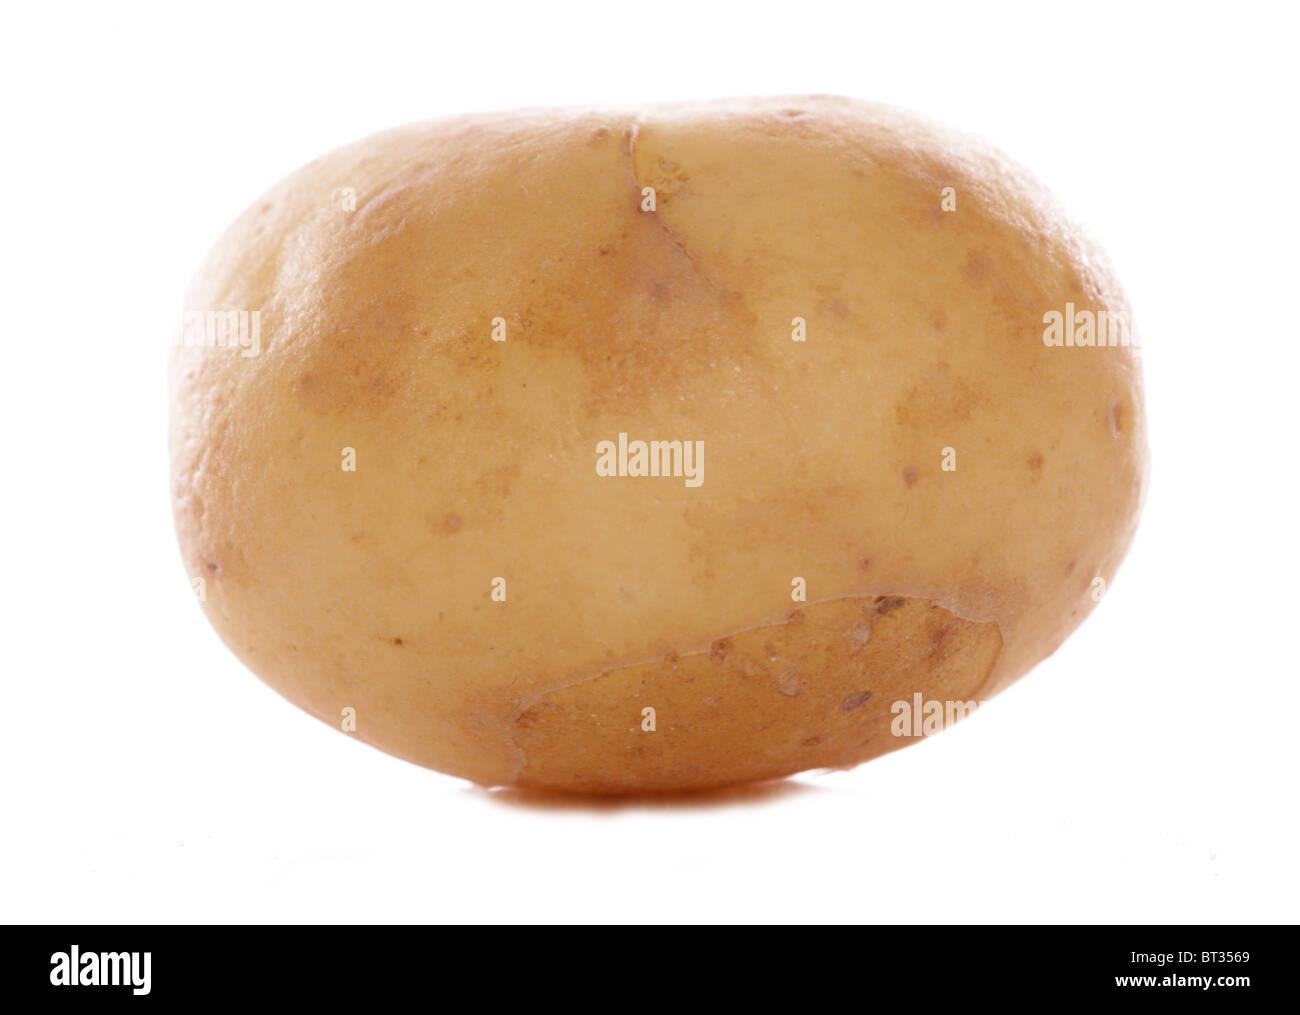 Baby pearl potatoe studio cutout - Stock Image